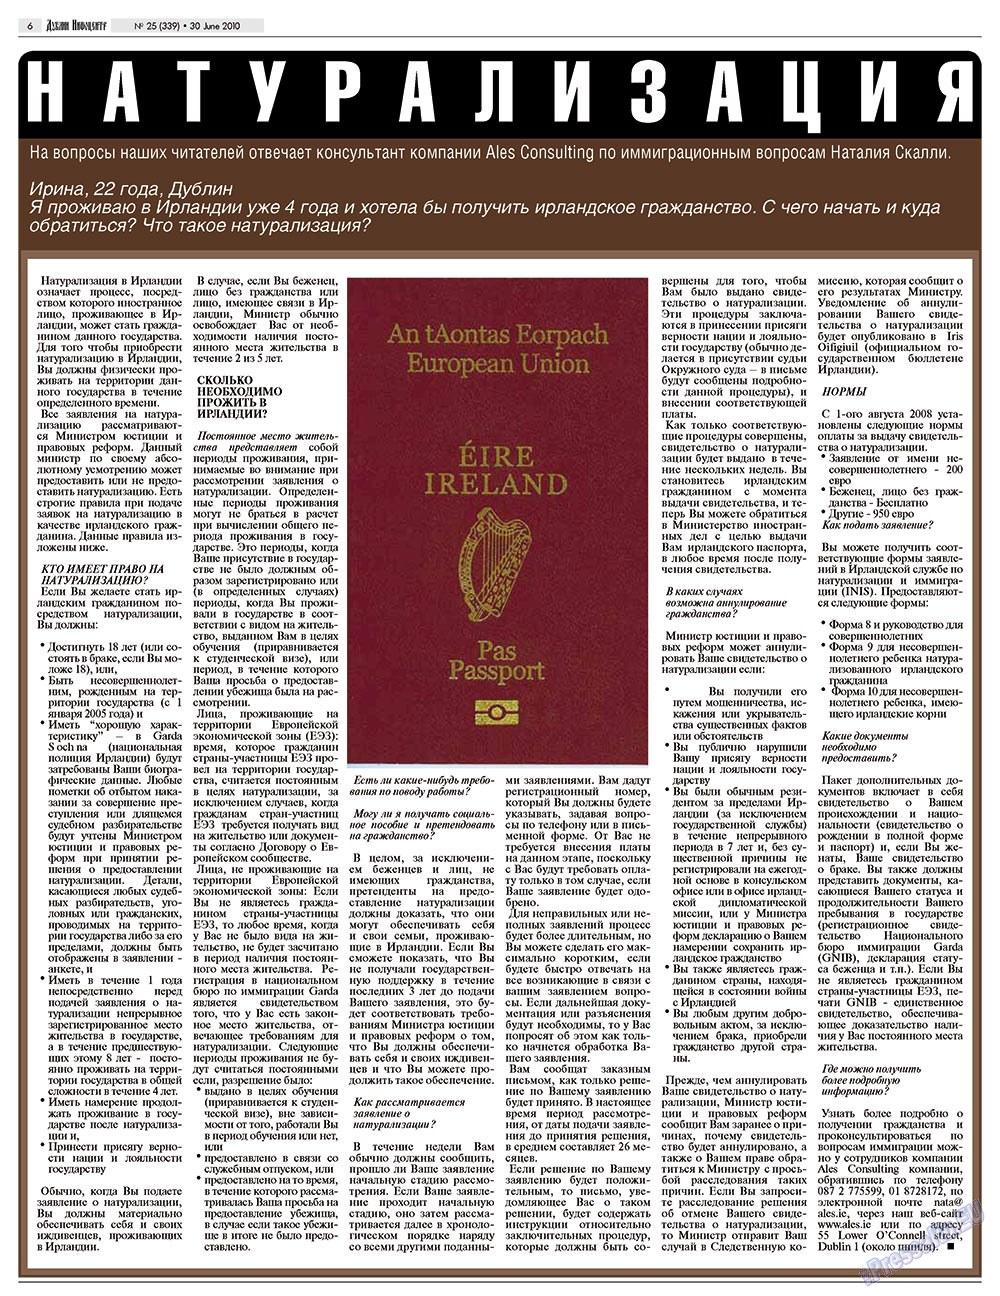 Дублин инфоцентр (газета). 2010 год, номер 25, стр. 6